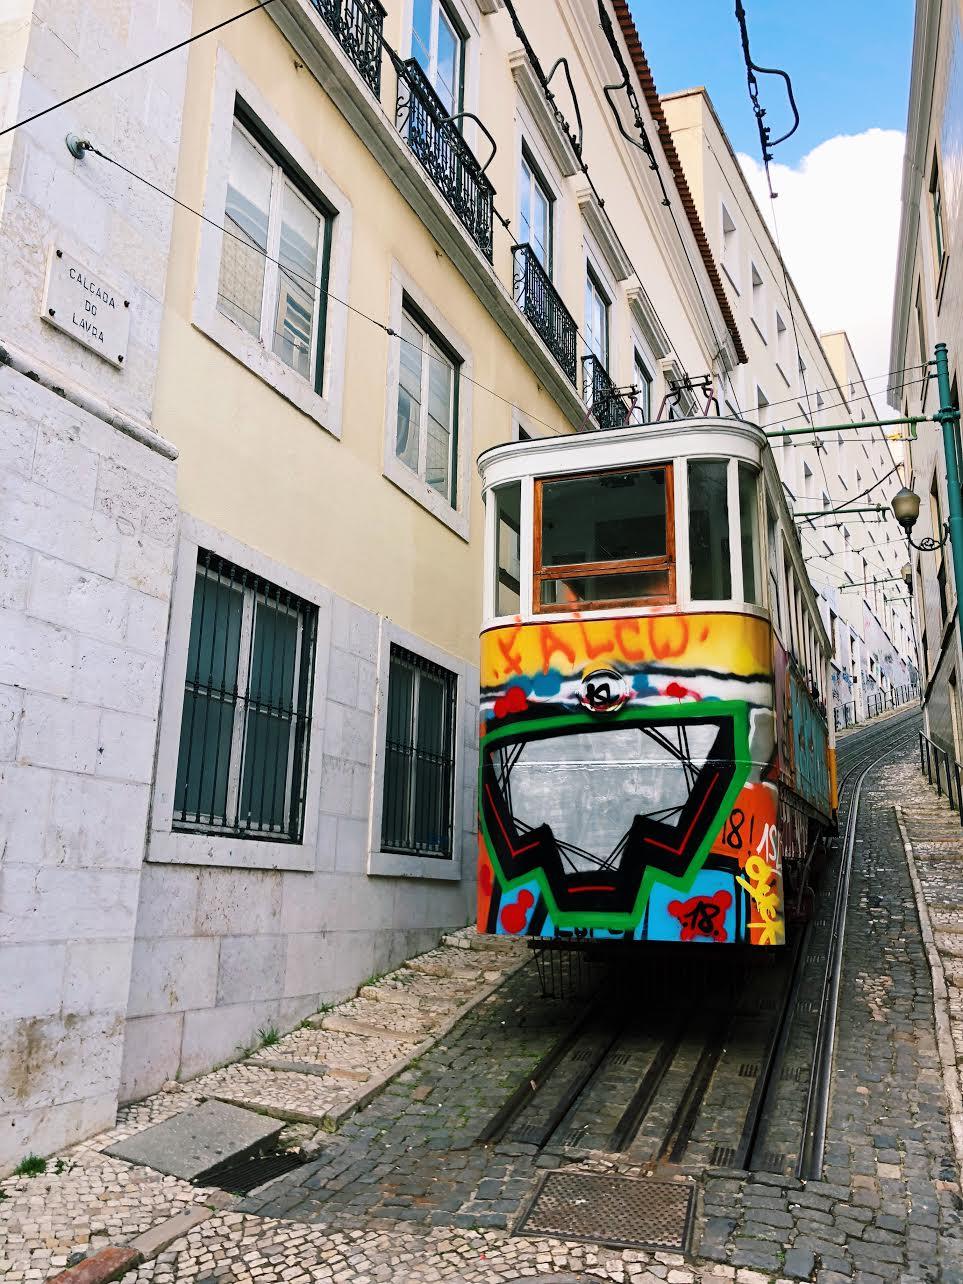 Muslim-travel-tips-Lisbon-halal-guide-transportation-tram